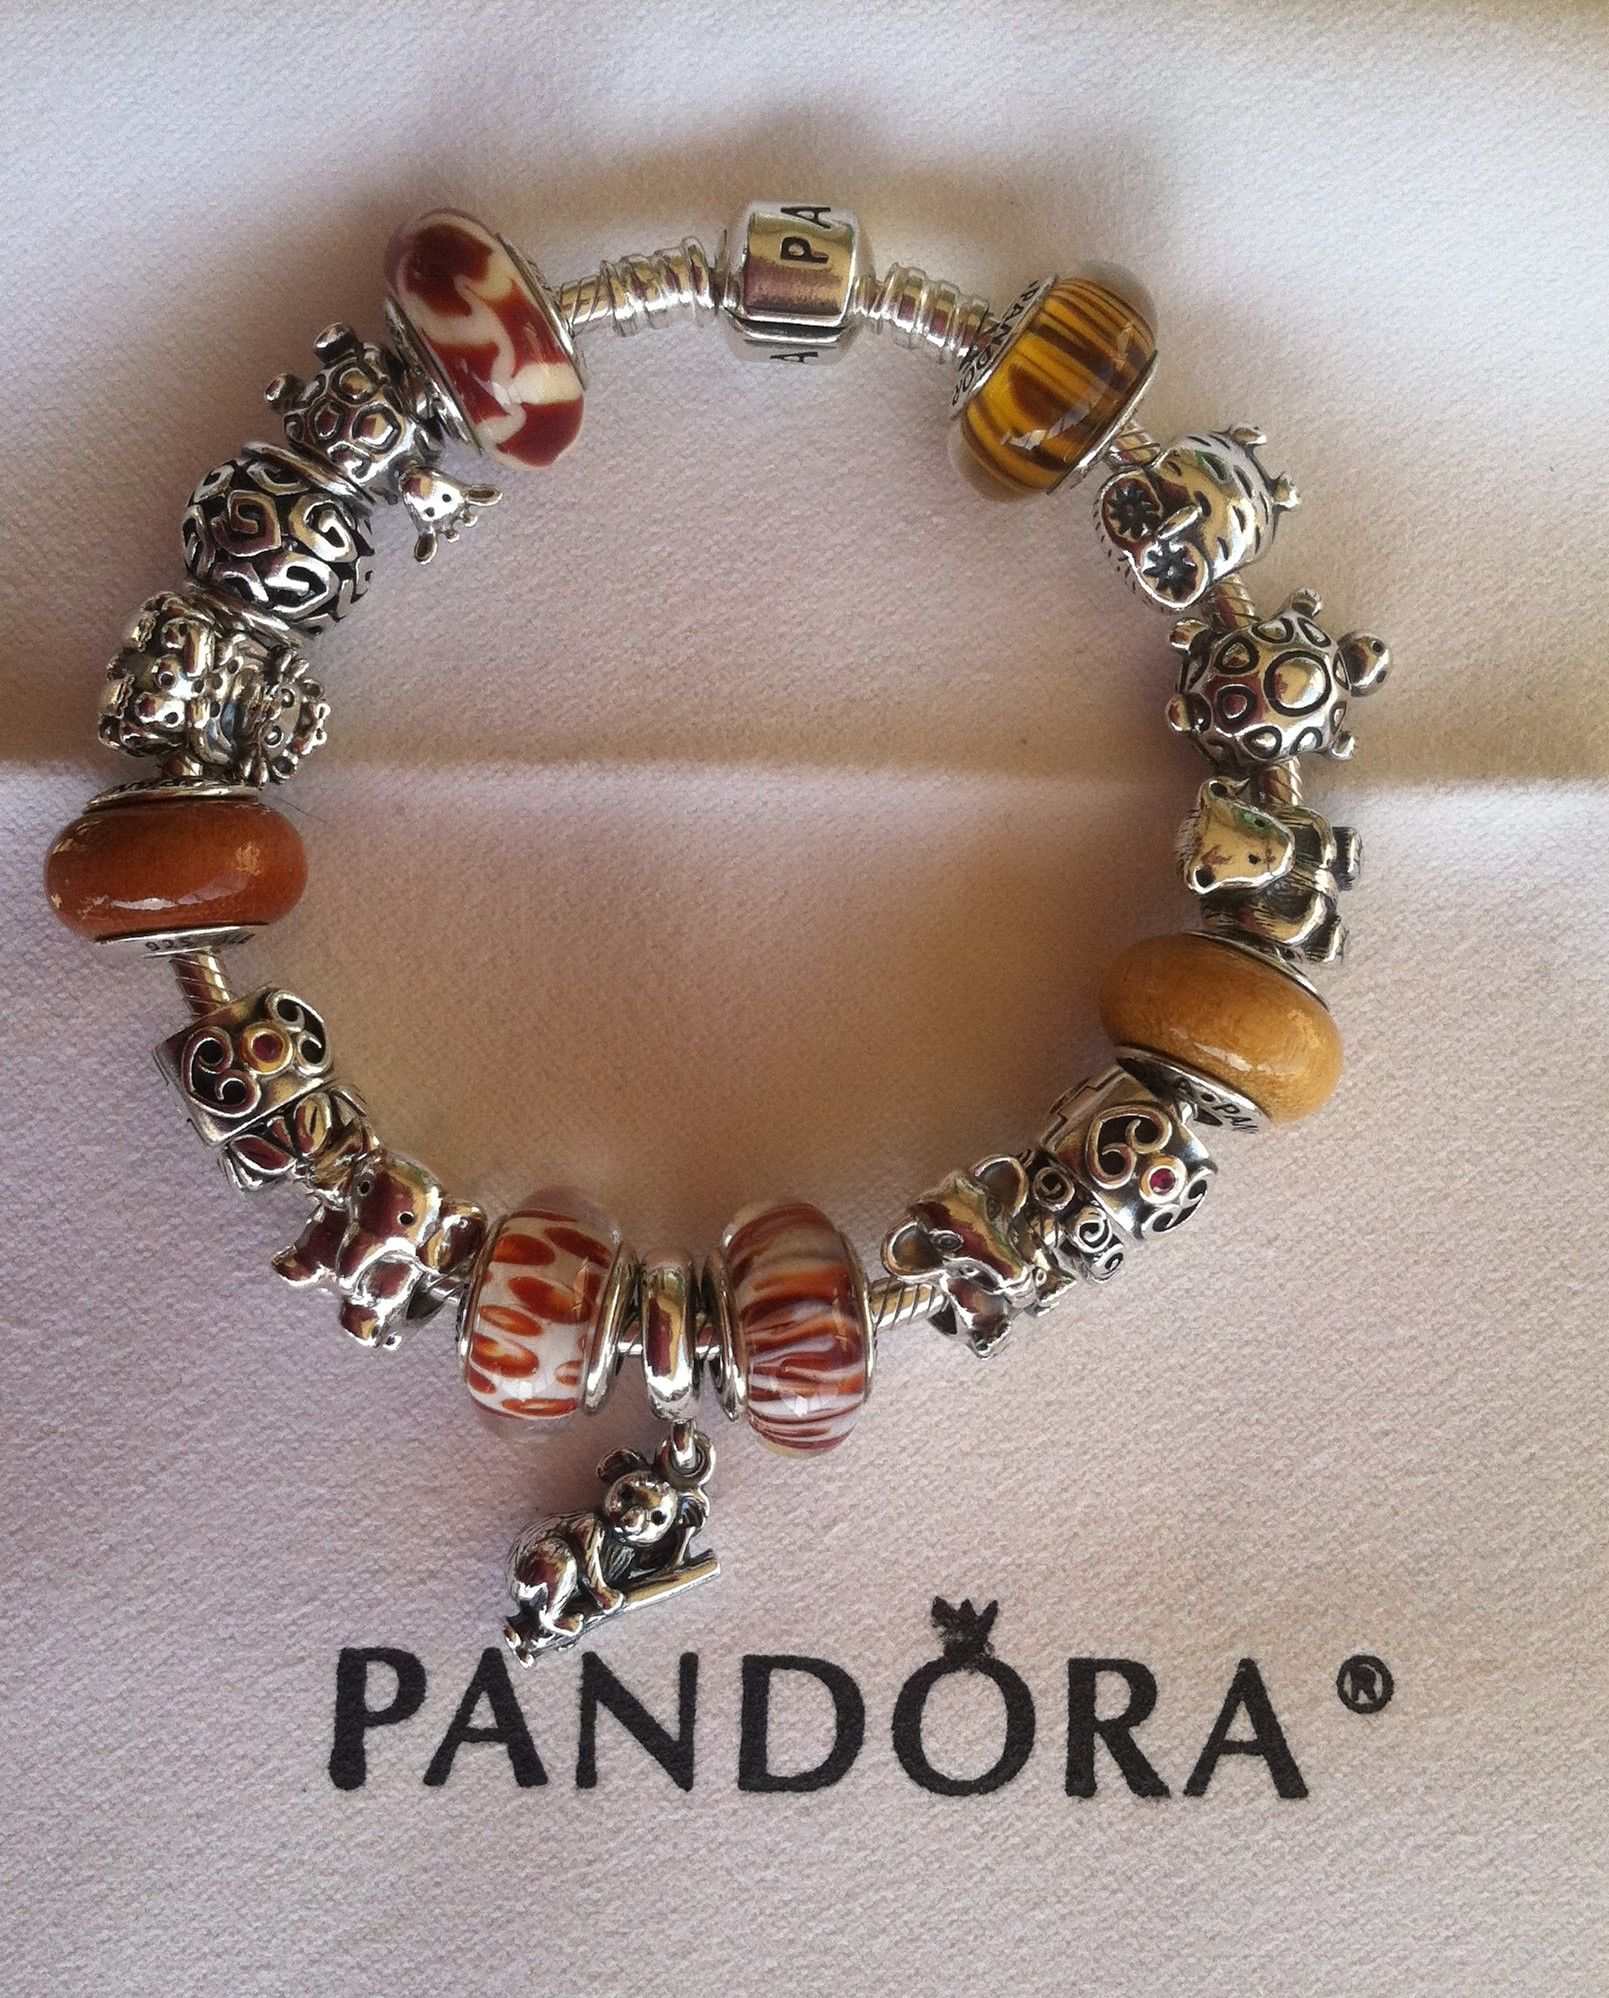 Jewelry Store Pandora: Charm Bracelets From Pandora Pandora Charm Store